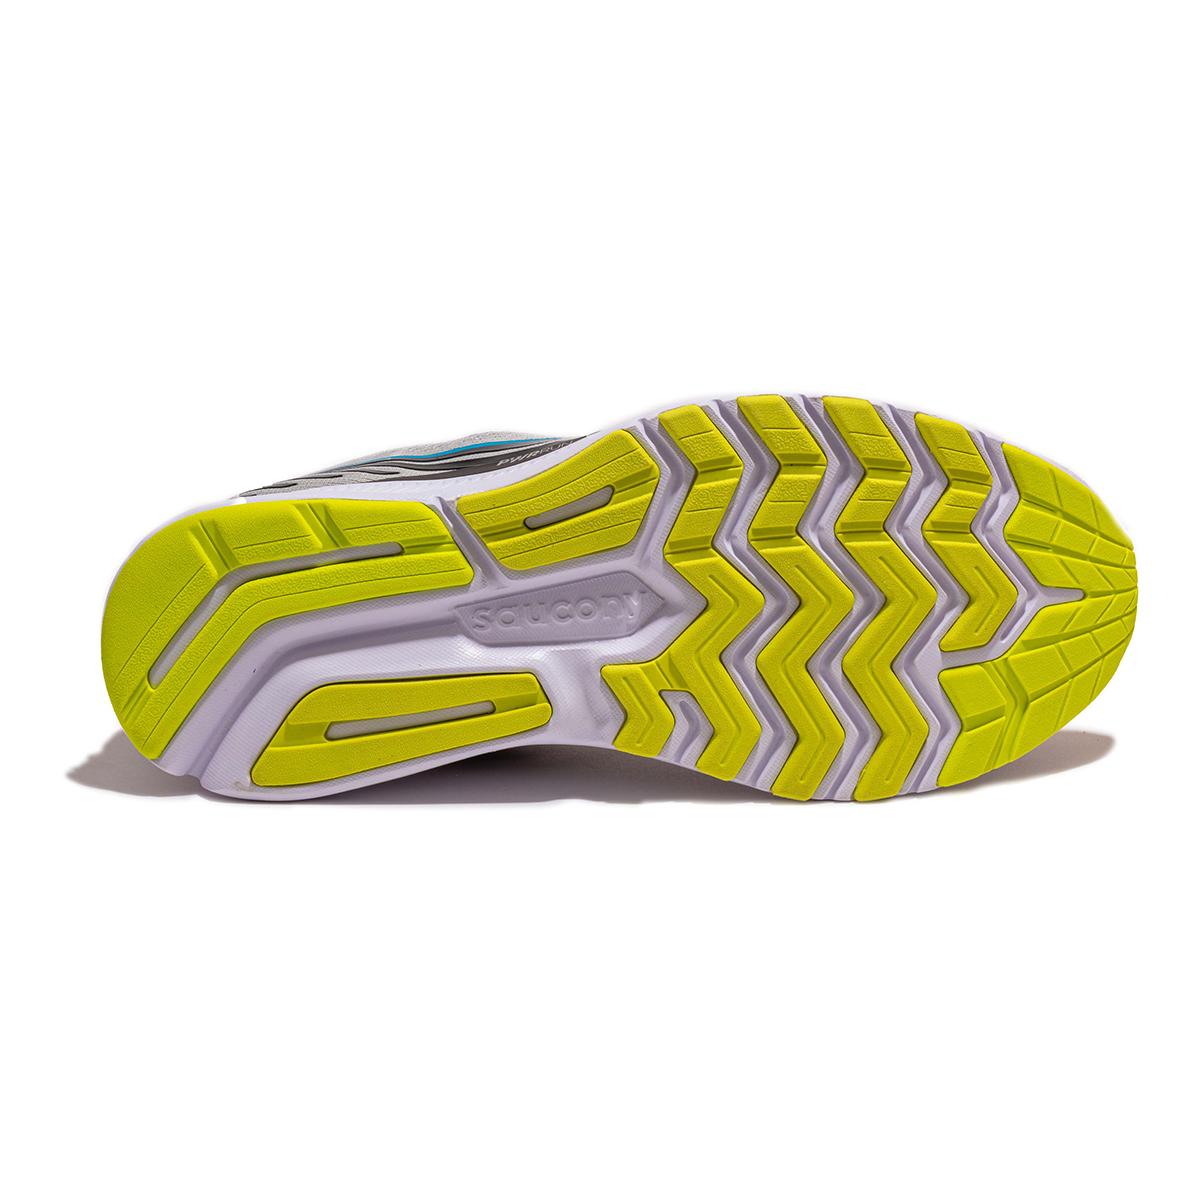 Men's Saucony Ride 14 Running Shoe, , large, image 4